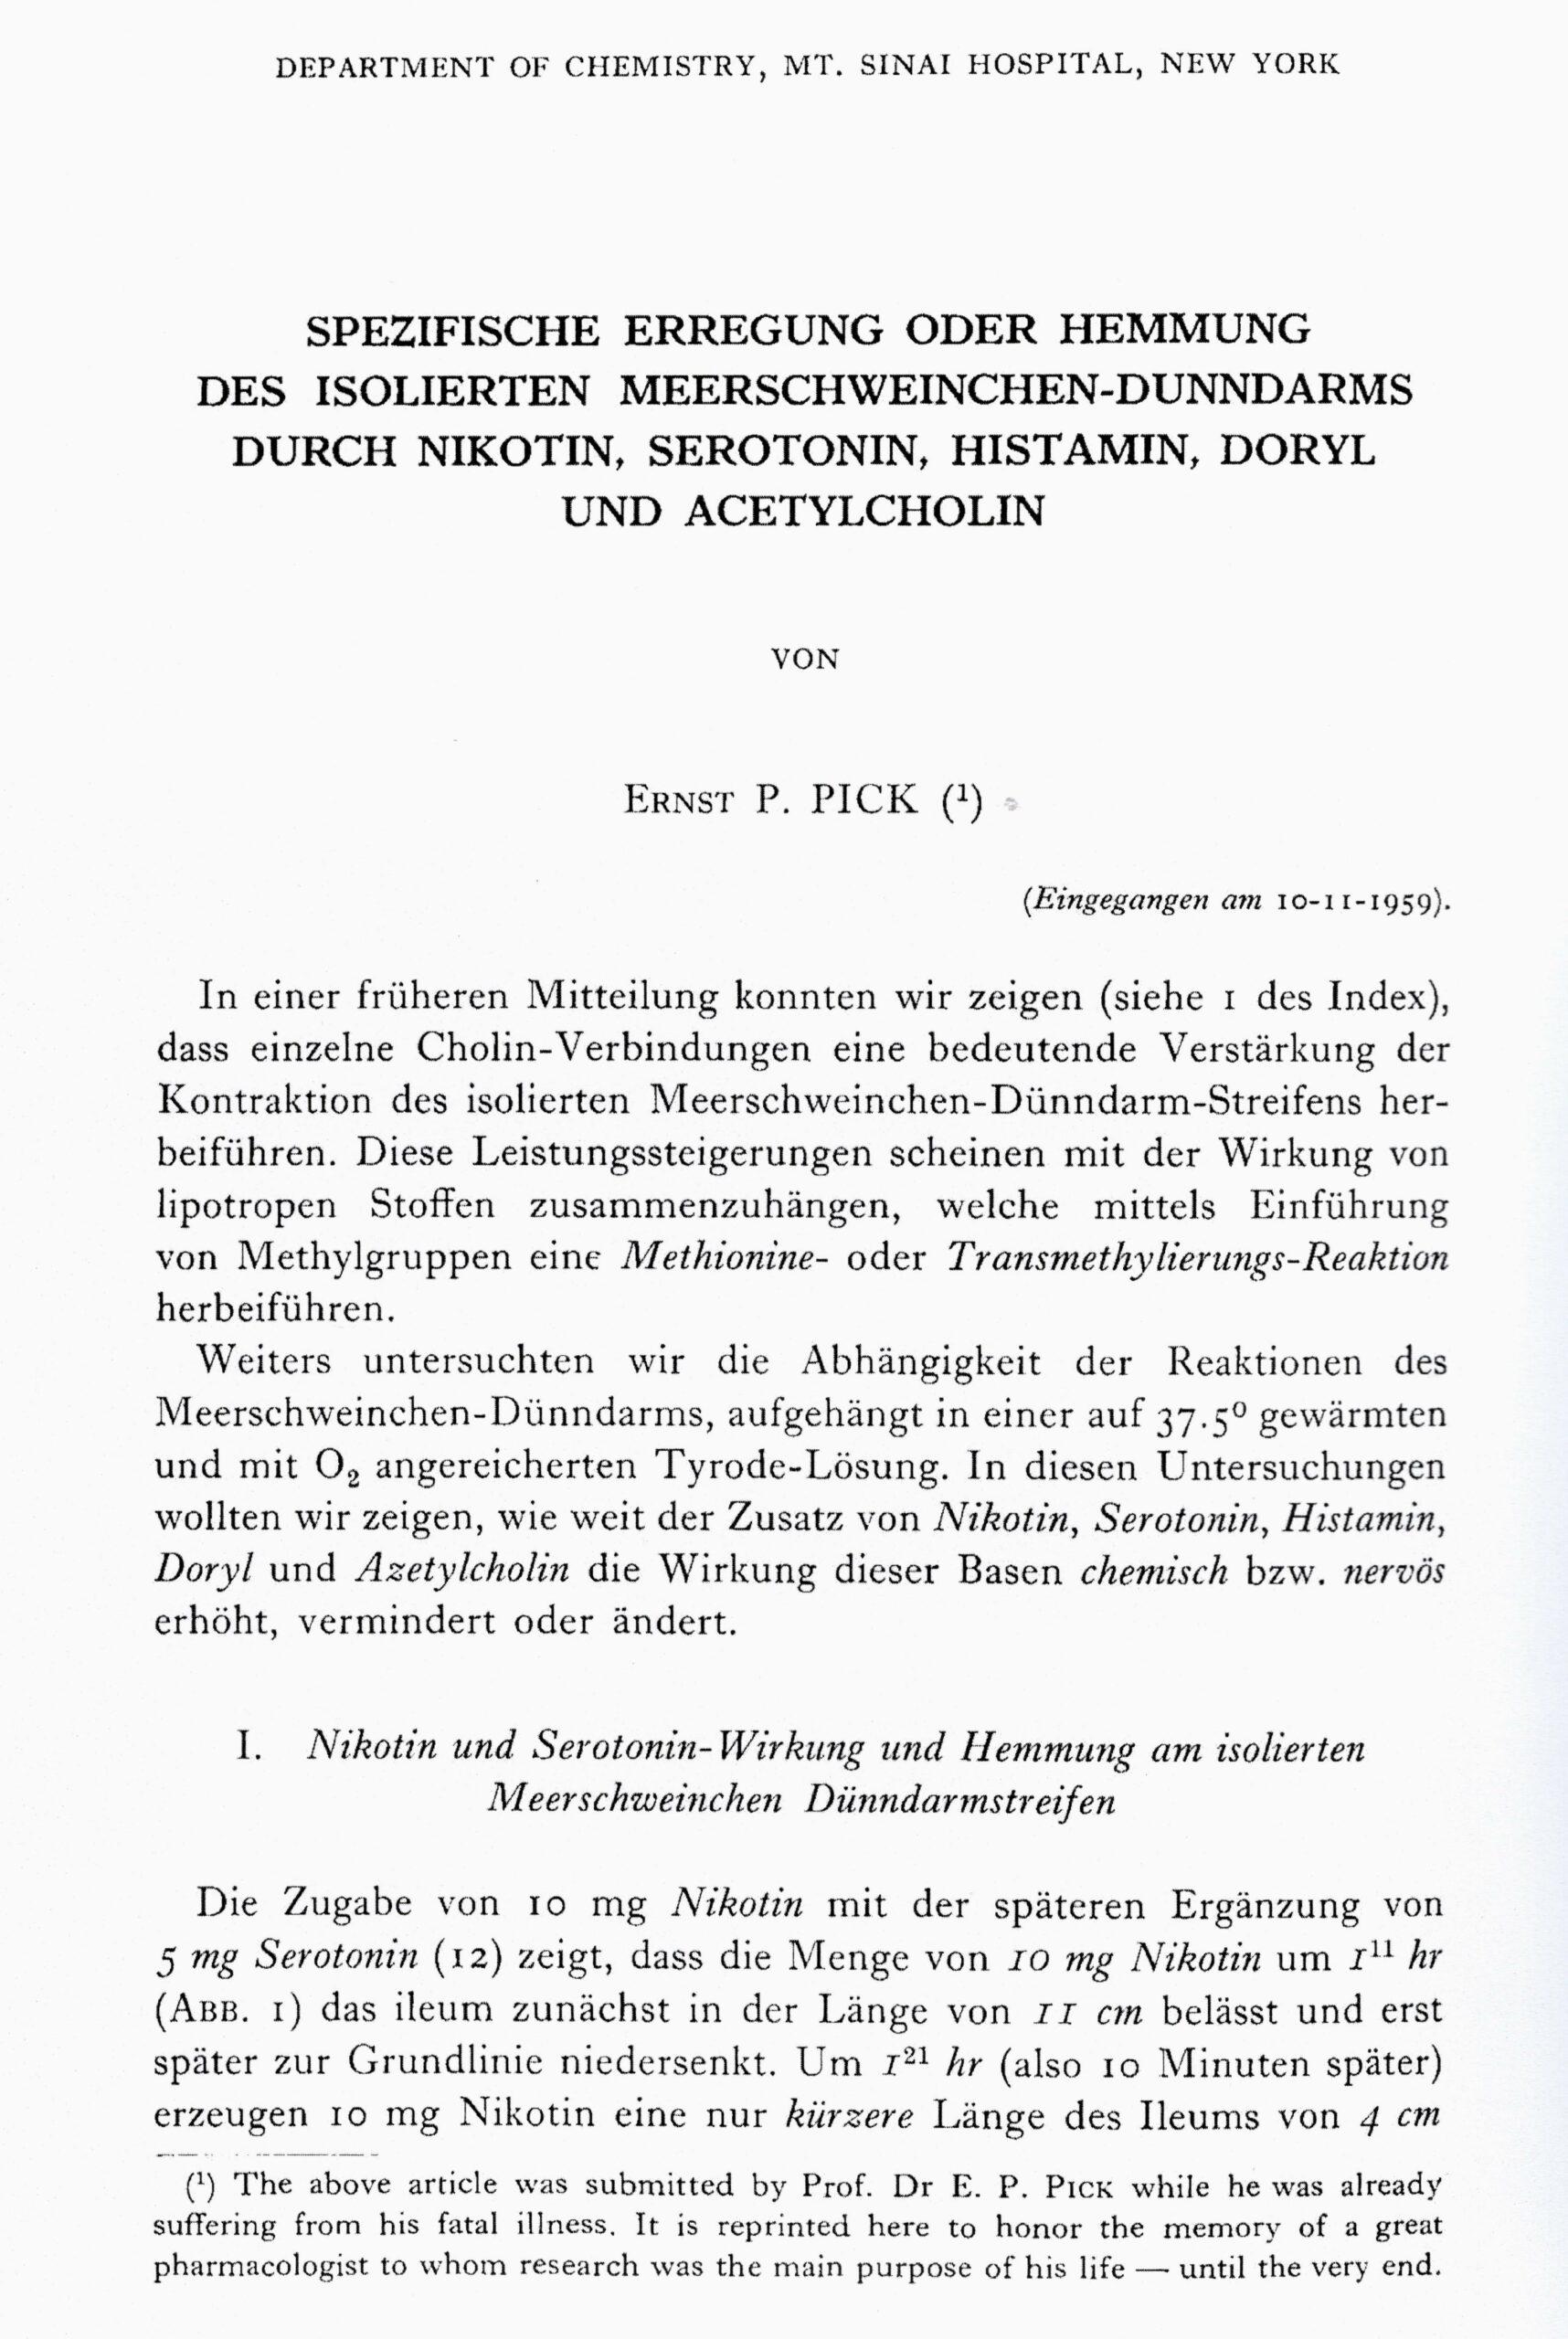 Arch Int Pharmacodyn et de Therap 1960